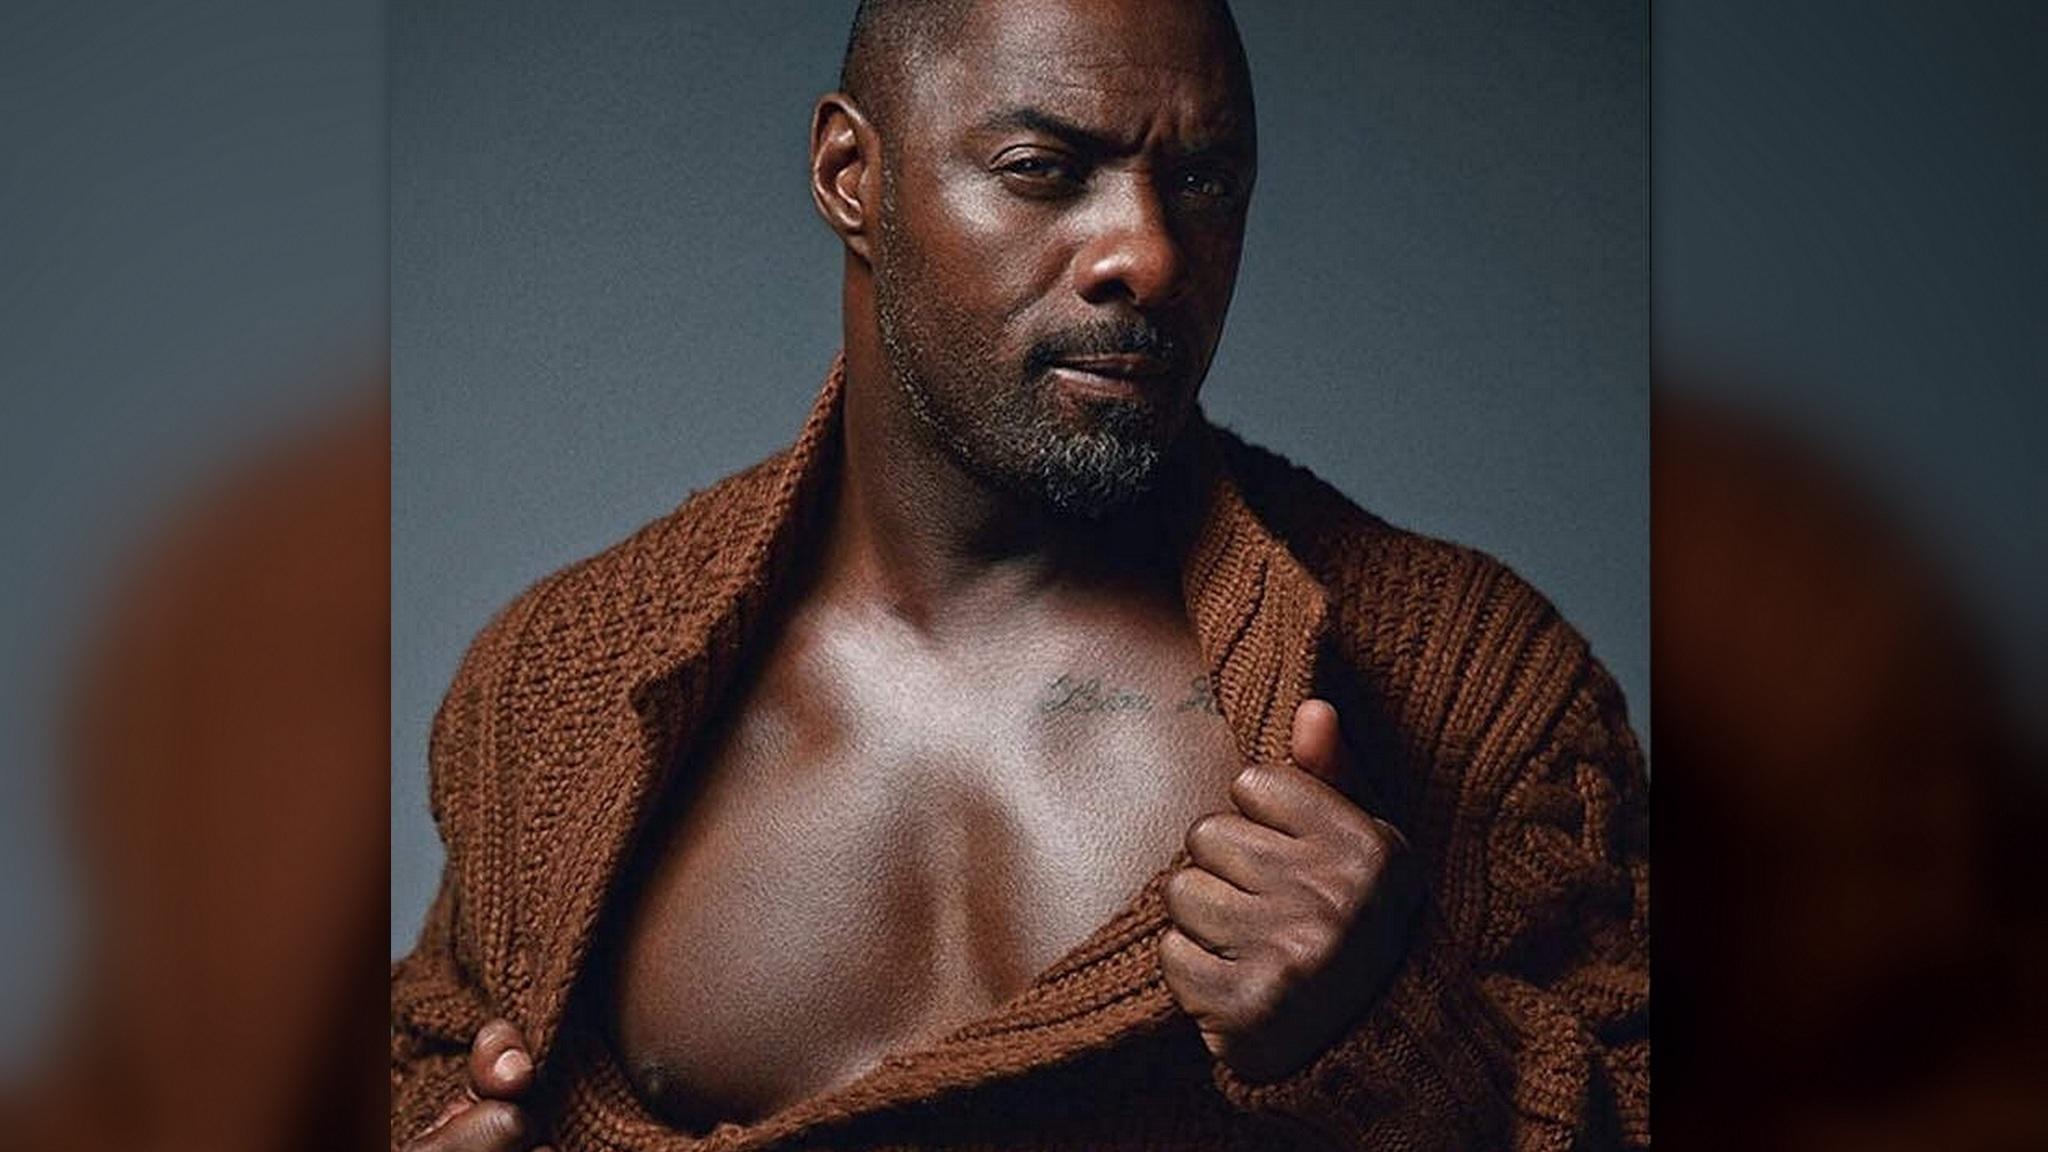 Idris Elba Named People Magazine's 'Sexiest Man Alive'!